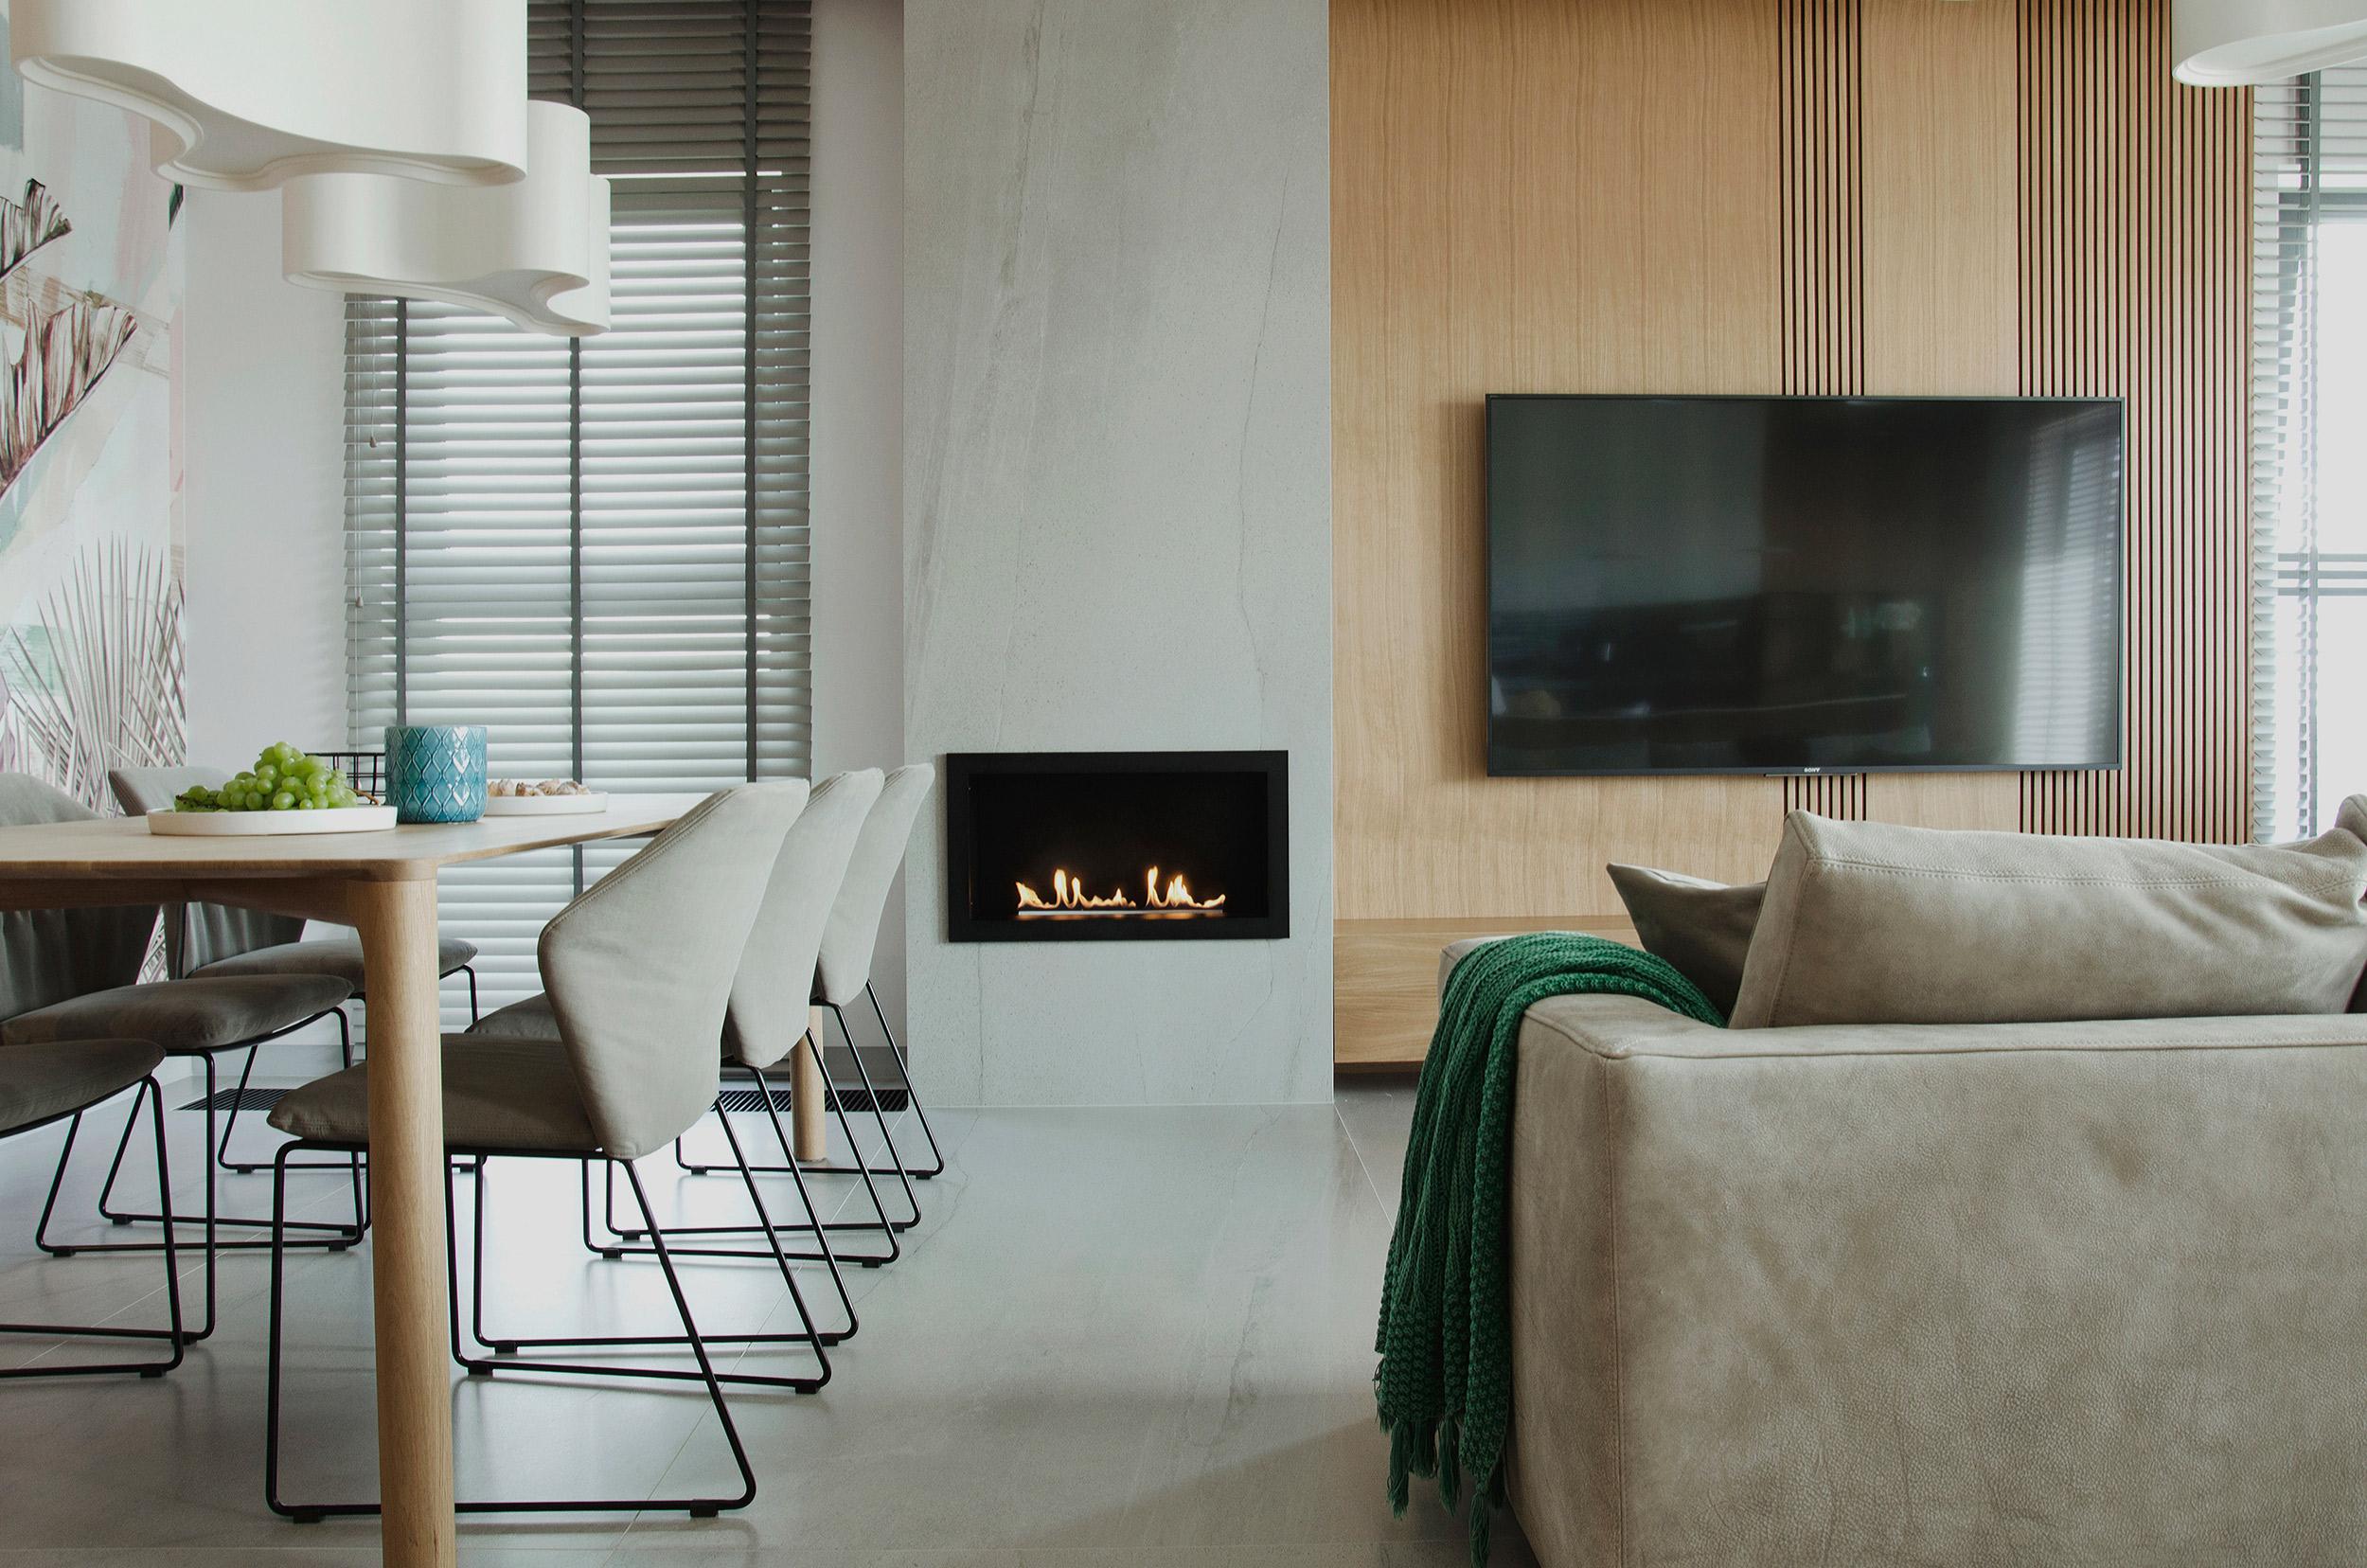 Primefire-in-Casing-Private-Apartment-Bydgoszcz-Poland-design-Interno-Iza-Gajewska-1.jpg